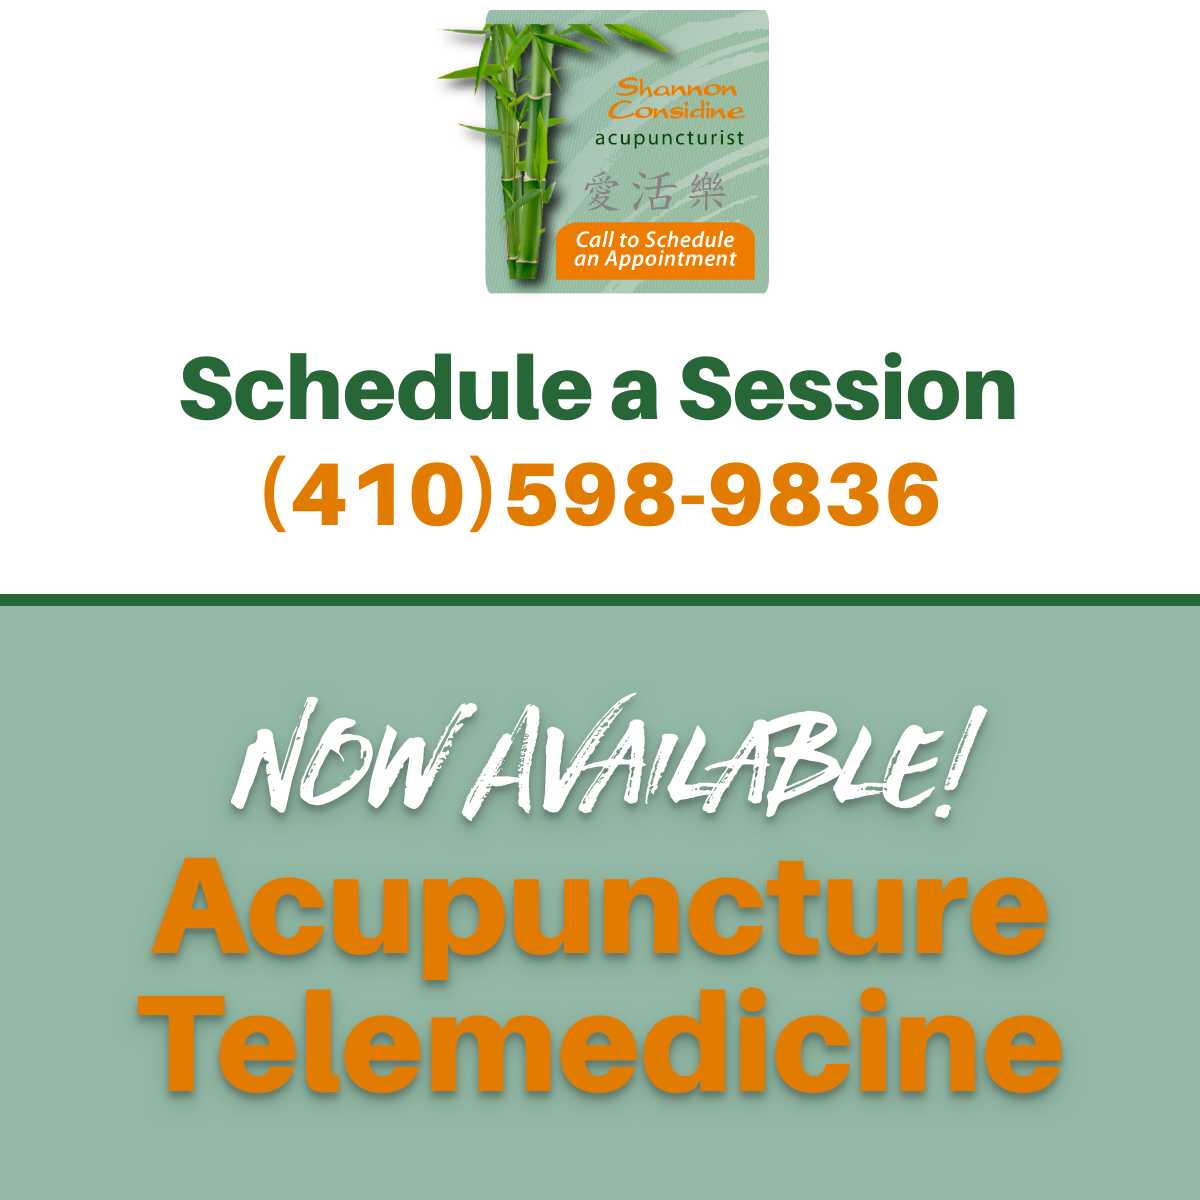 Acupuncture Telemedicine Available!